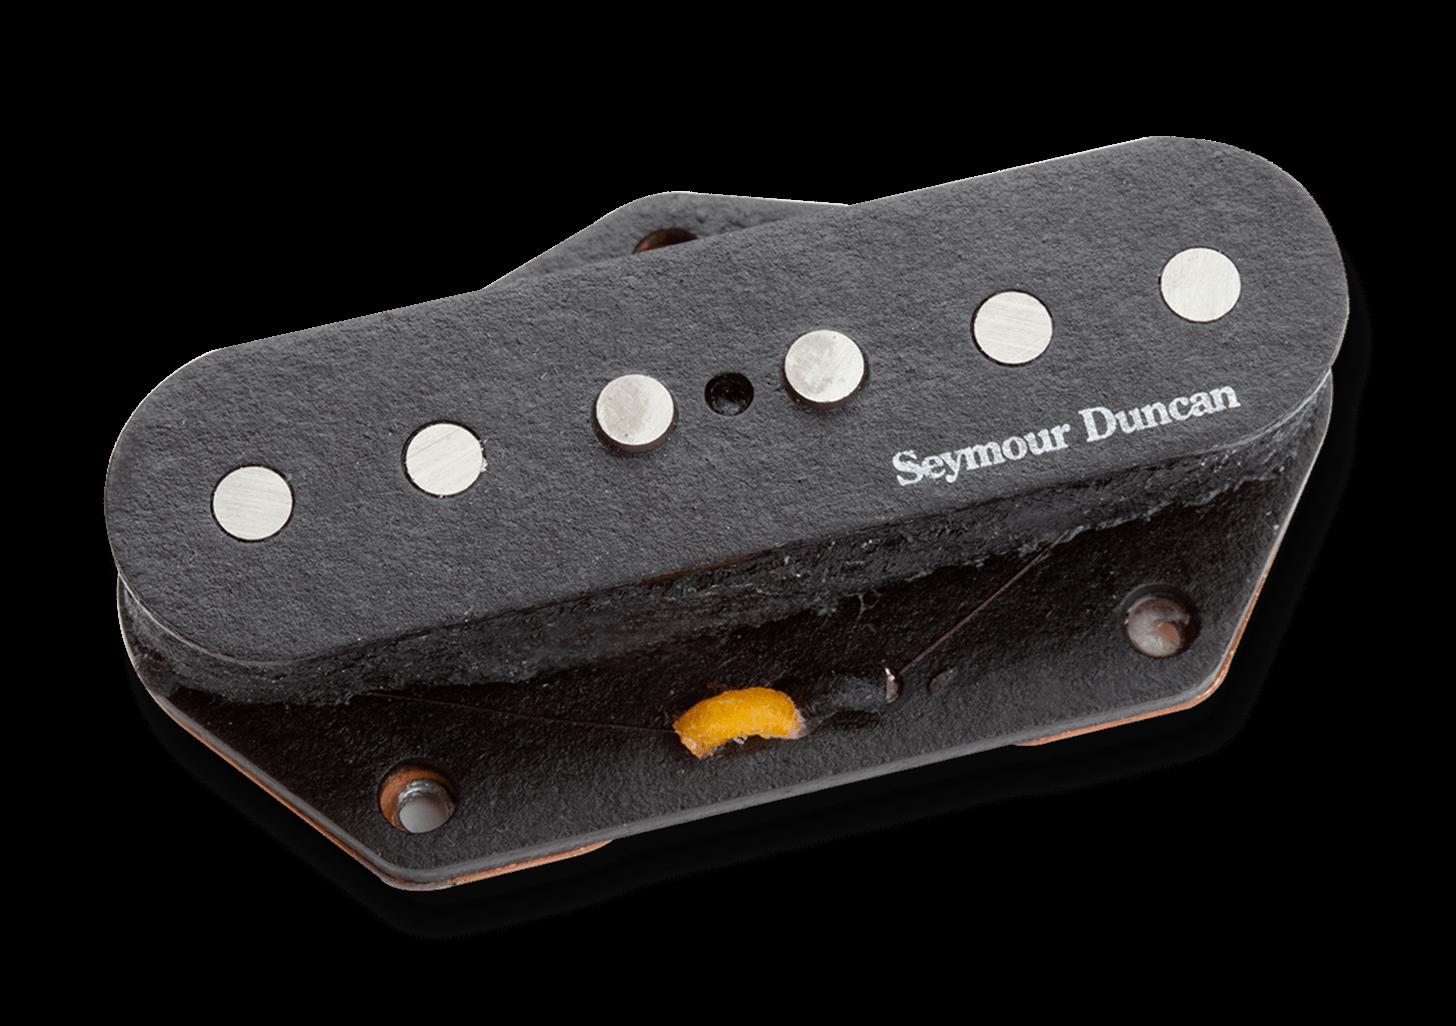 Fine Seymour Duncan Aptl 3Jd Jerry Donahue Tele Lead Electric Guitar Wiring Cloud Uslyletkolfr09Org